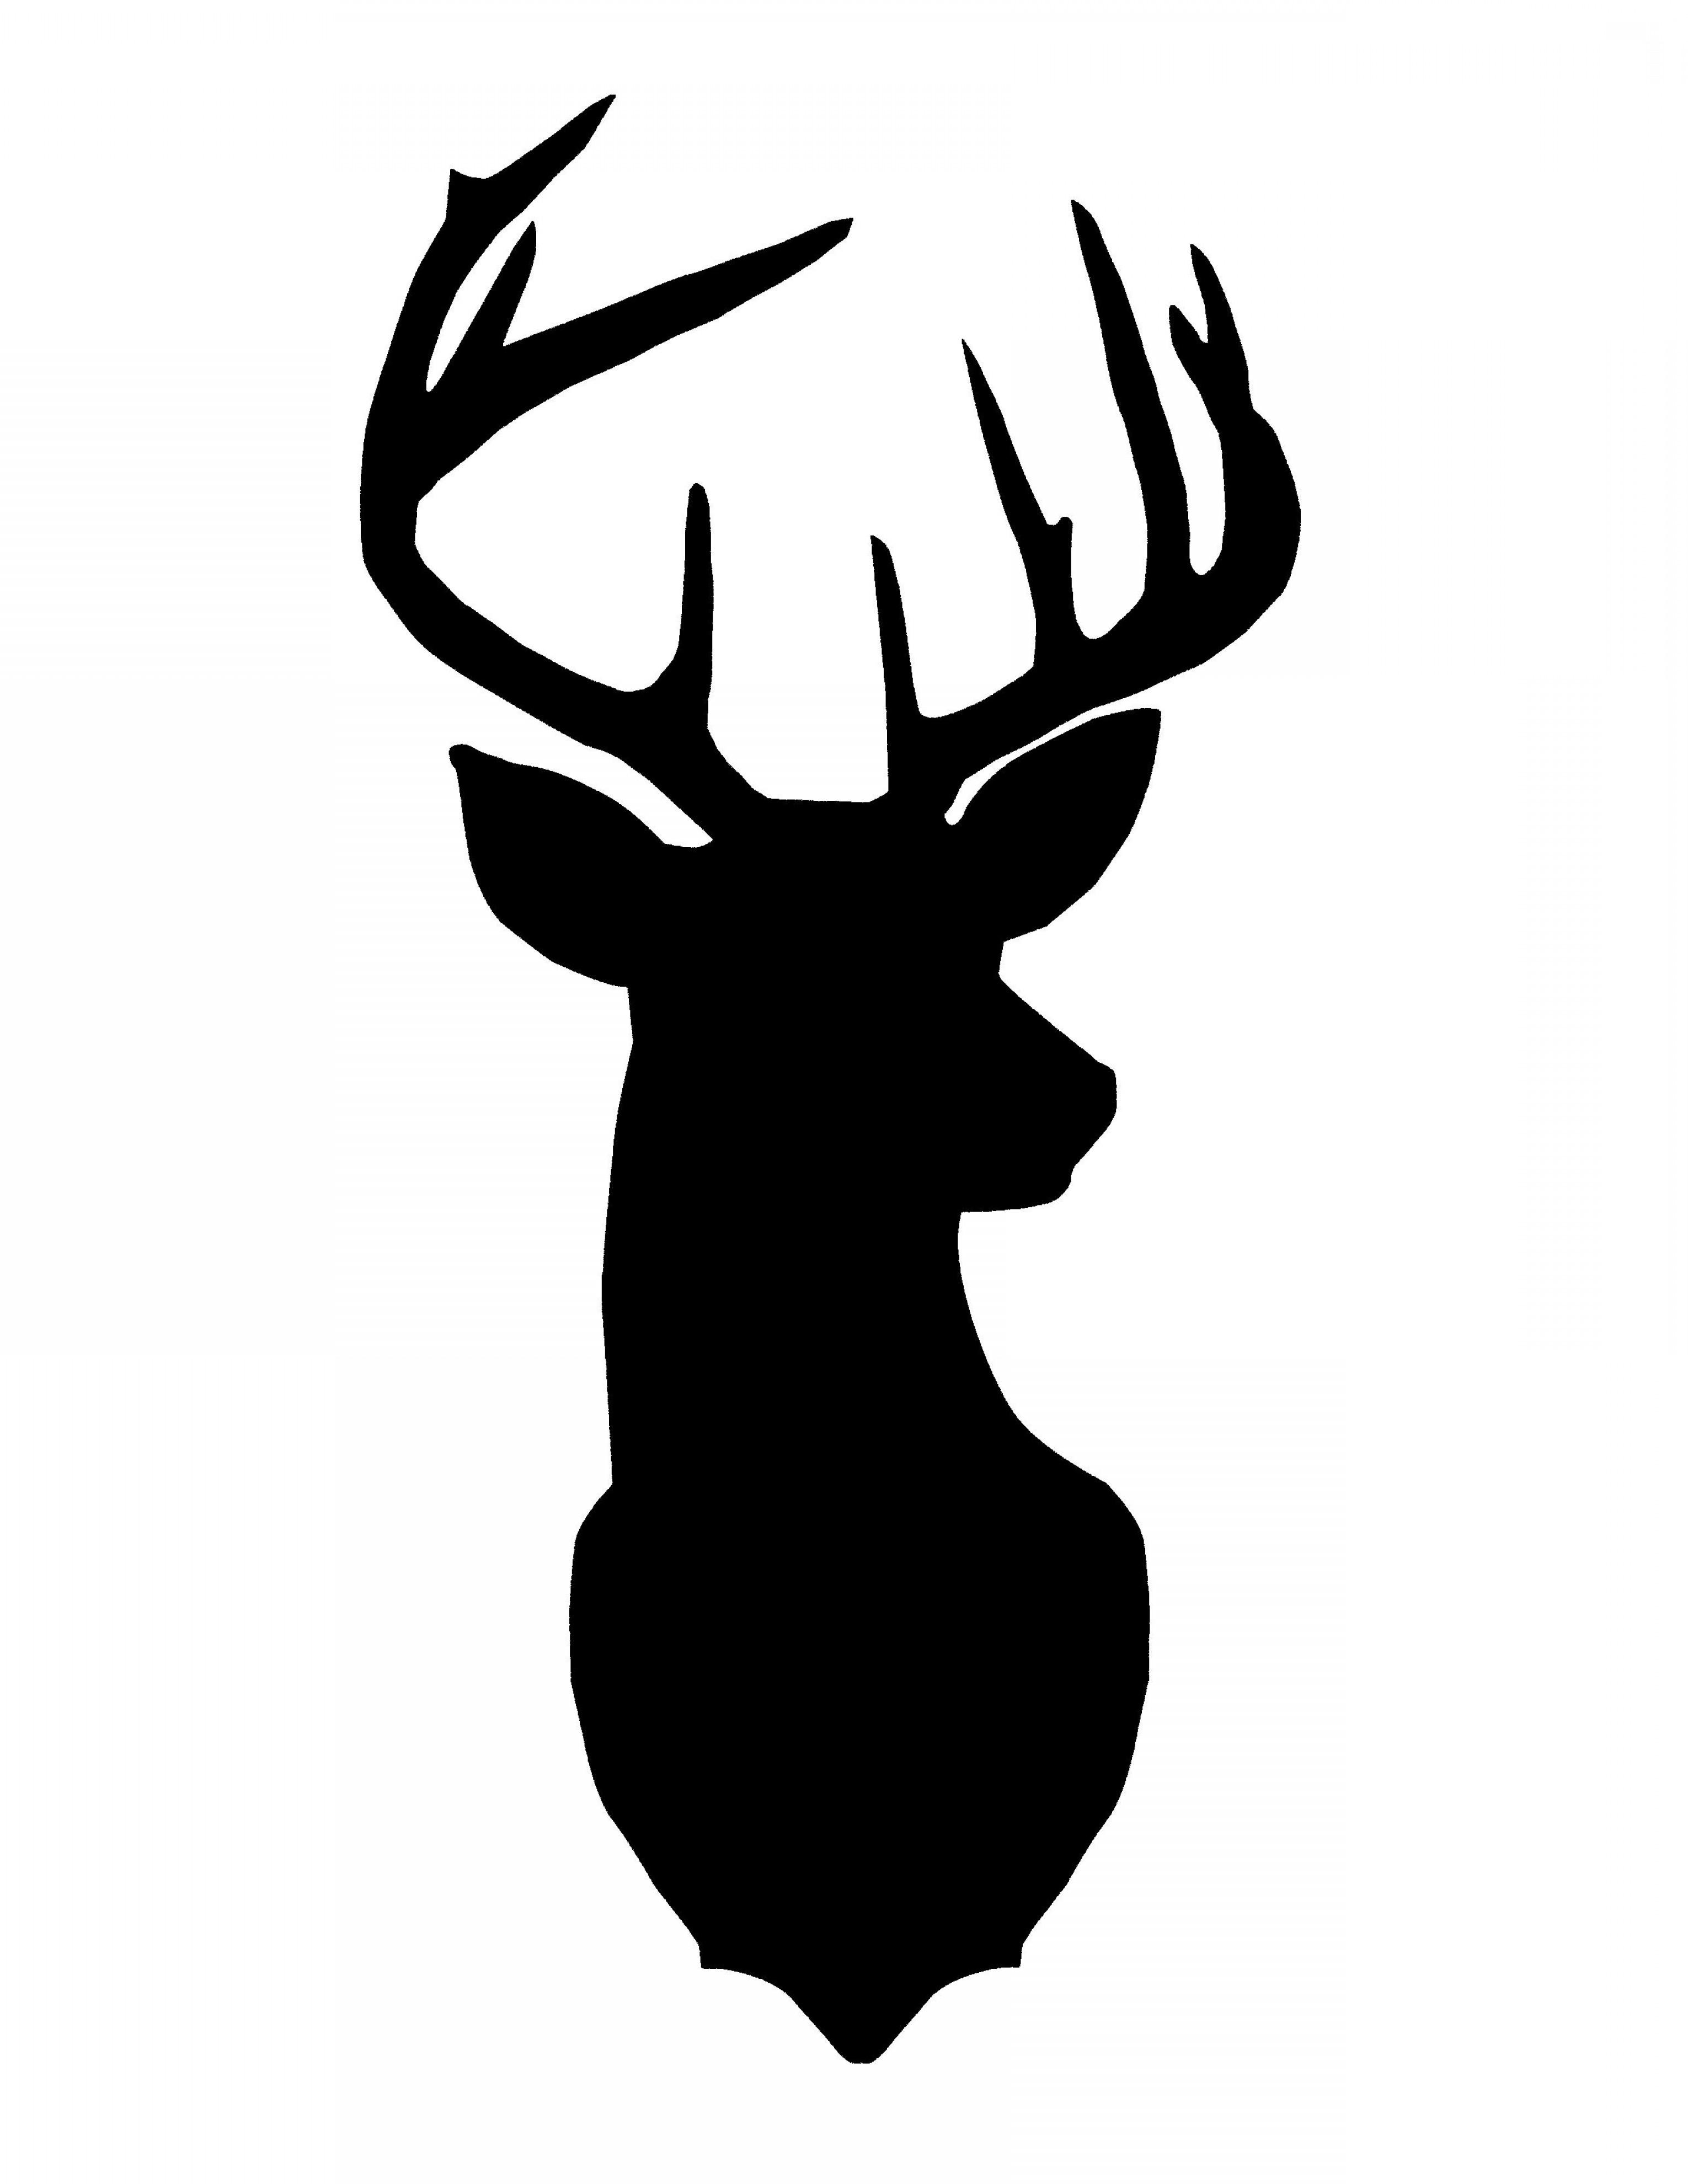 3060x3960 Deer Silhouette Clip Art Whitetail Deer Clipart Deer Head